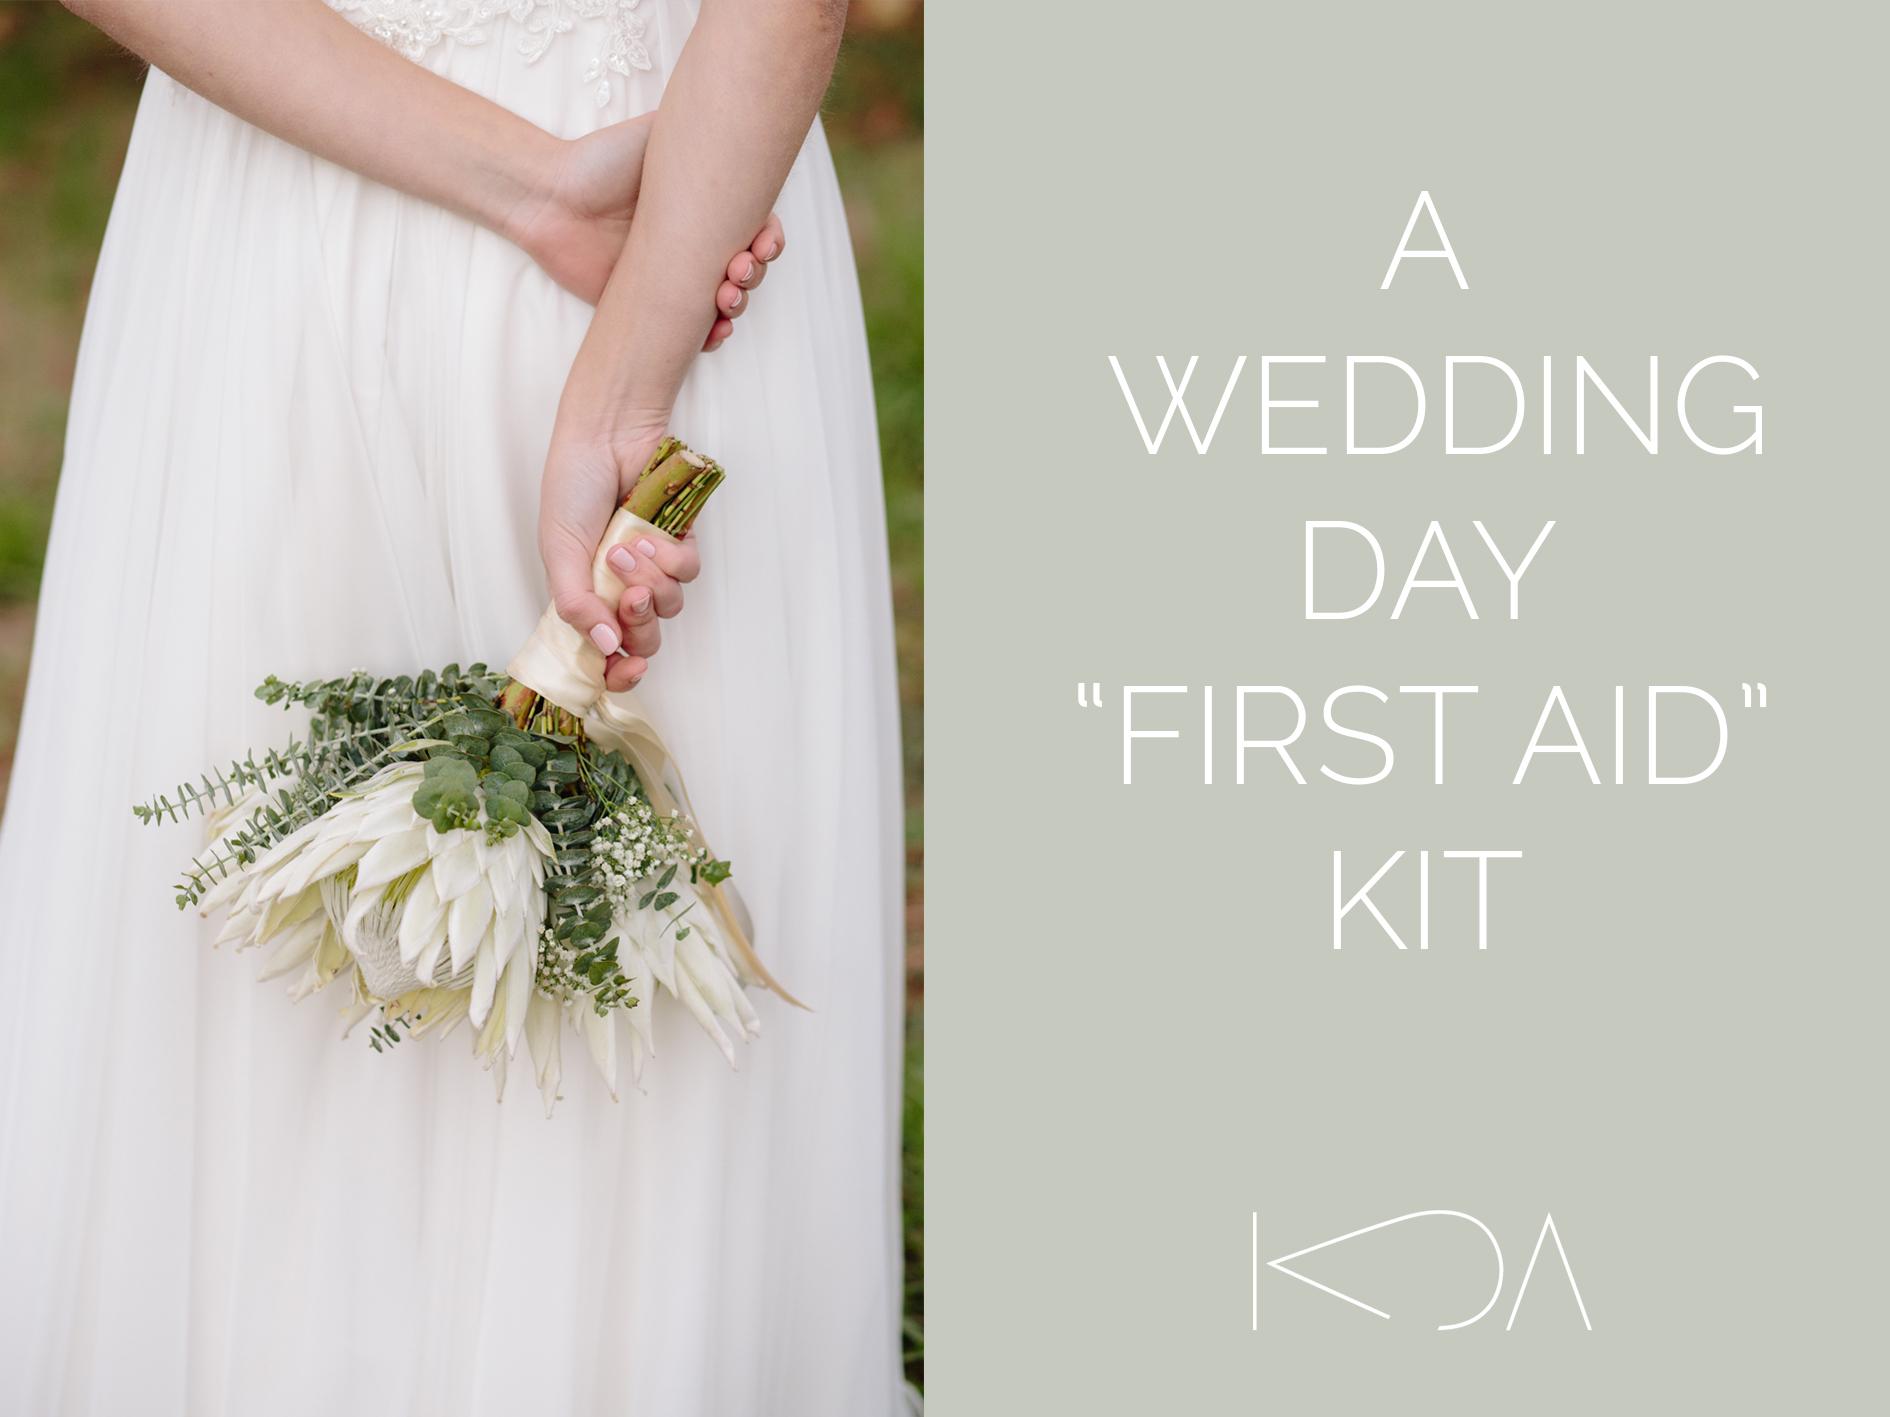 wedding first aid kit jpeg